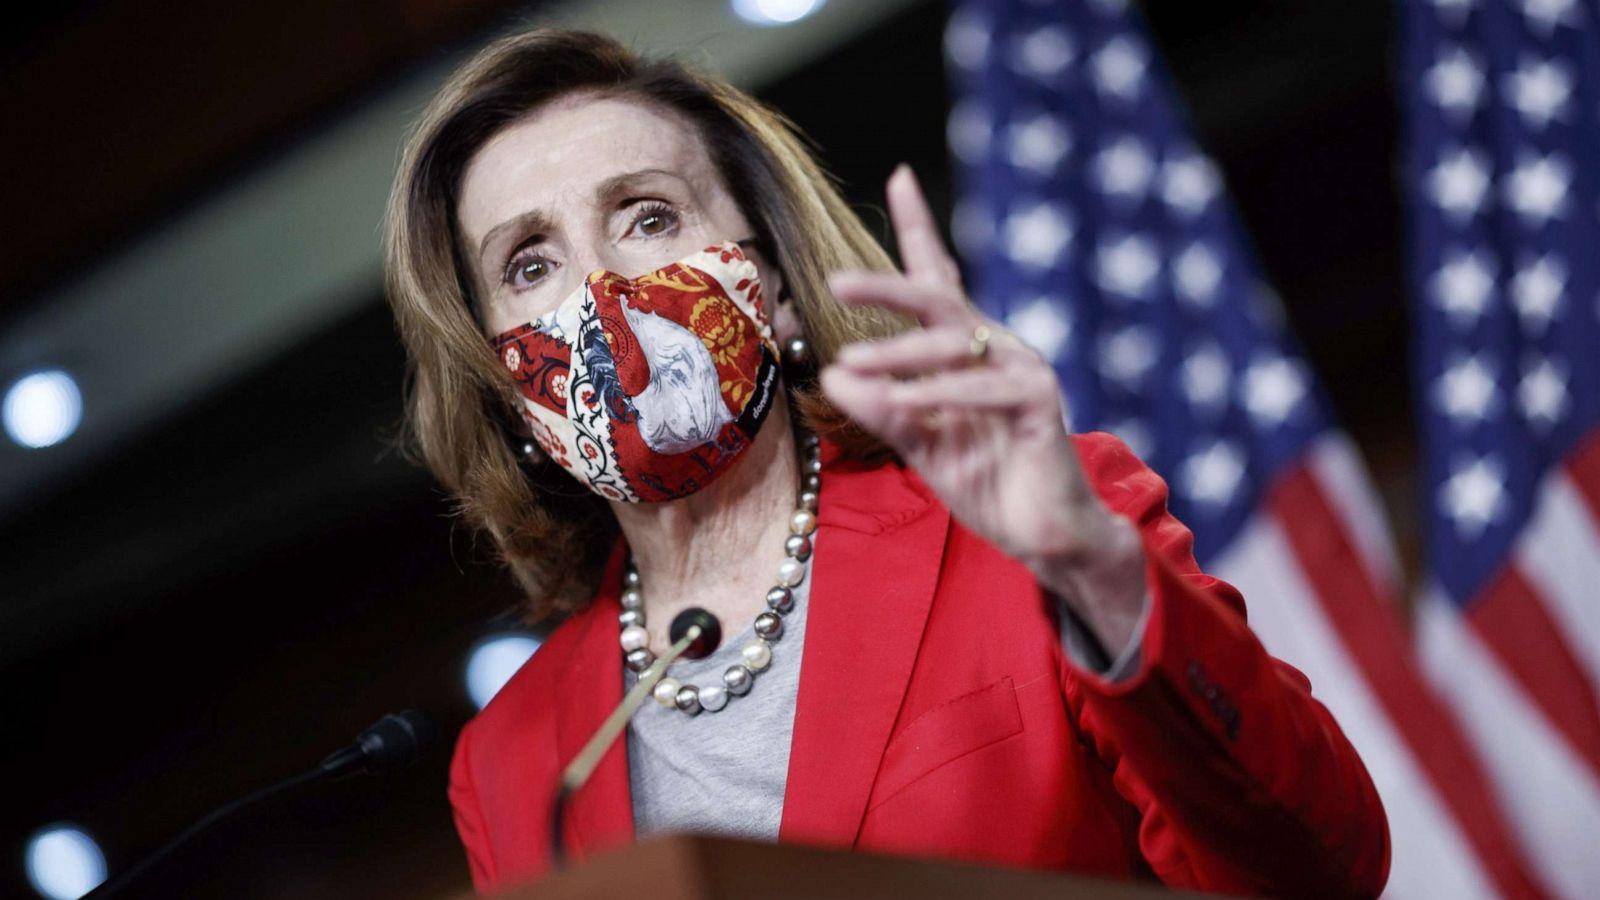 Pelosi wins tight race for House speaker - ABC News